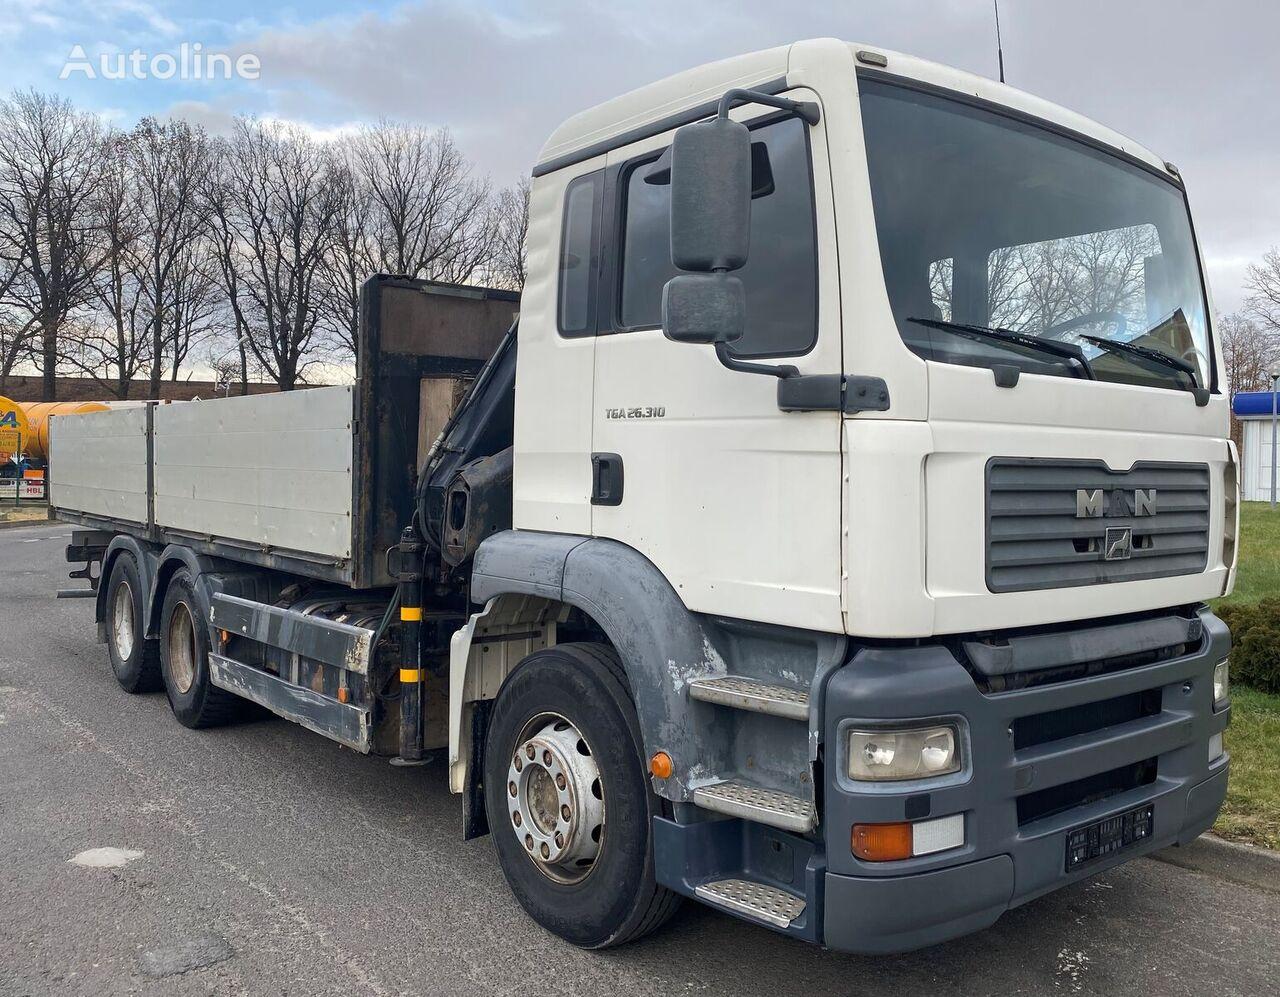 MAN 26.310 TGA 6x4 + HIAB 144 B-2 DUO camión plataforma